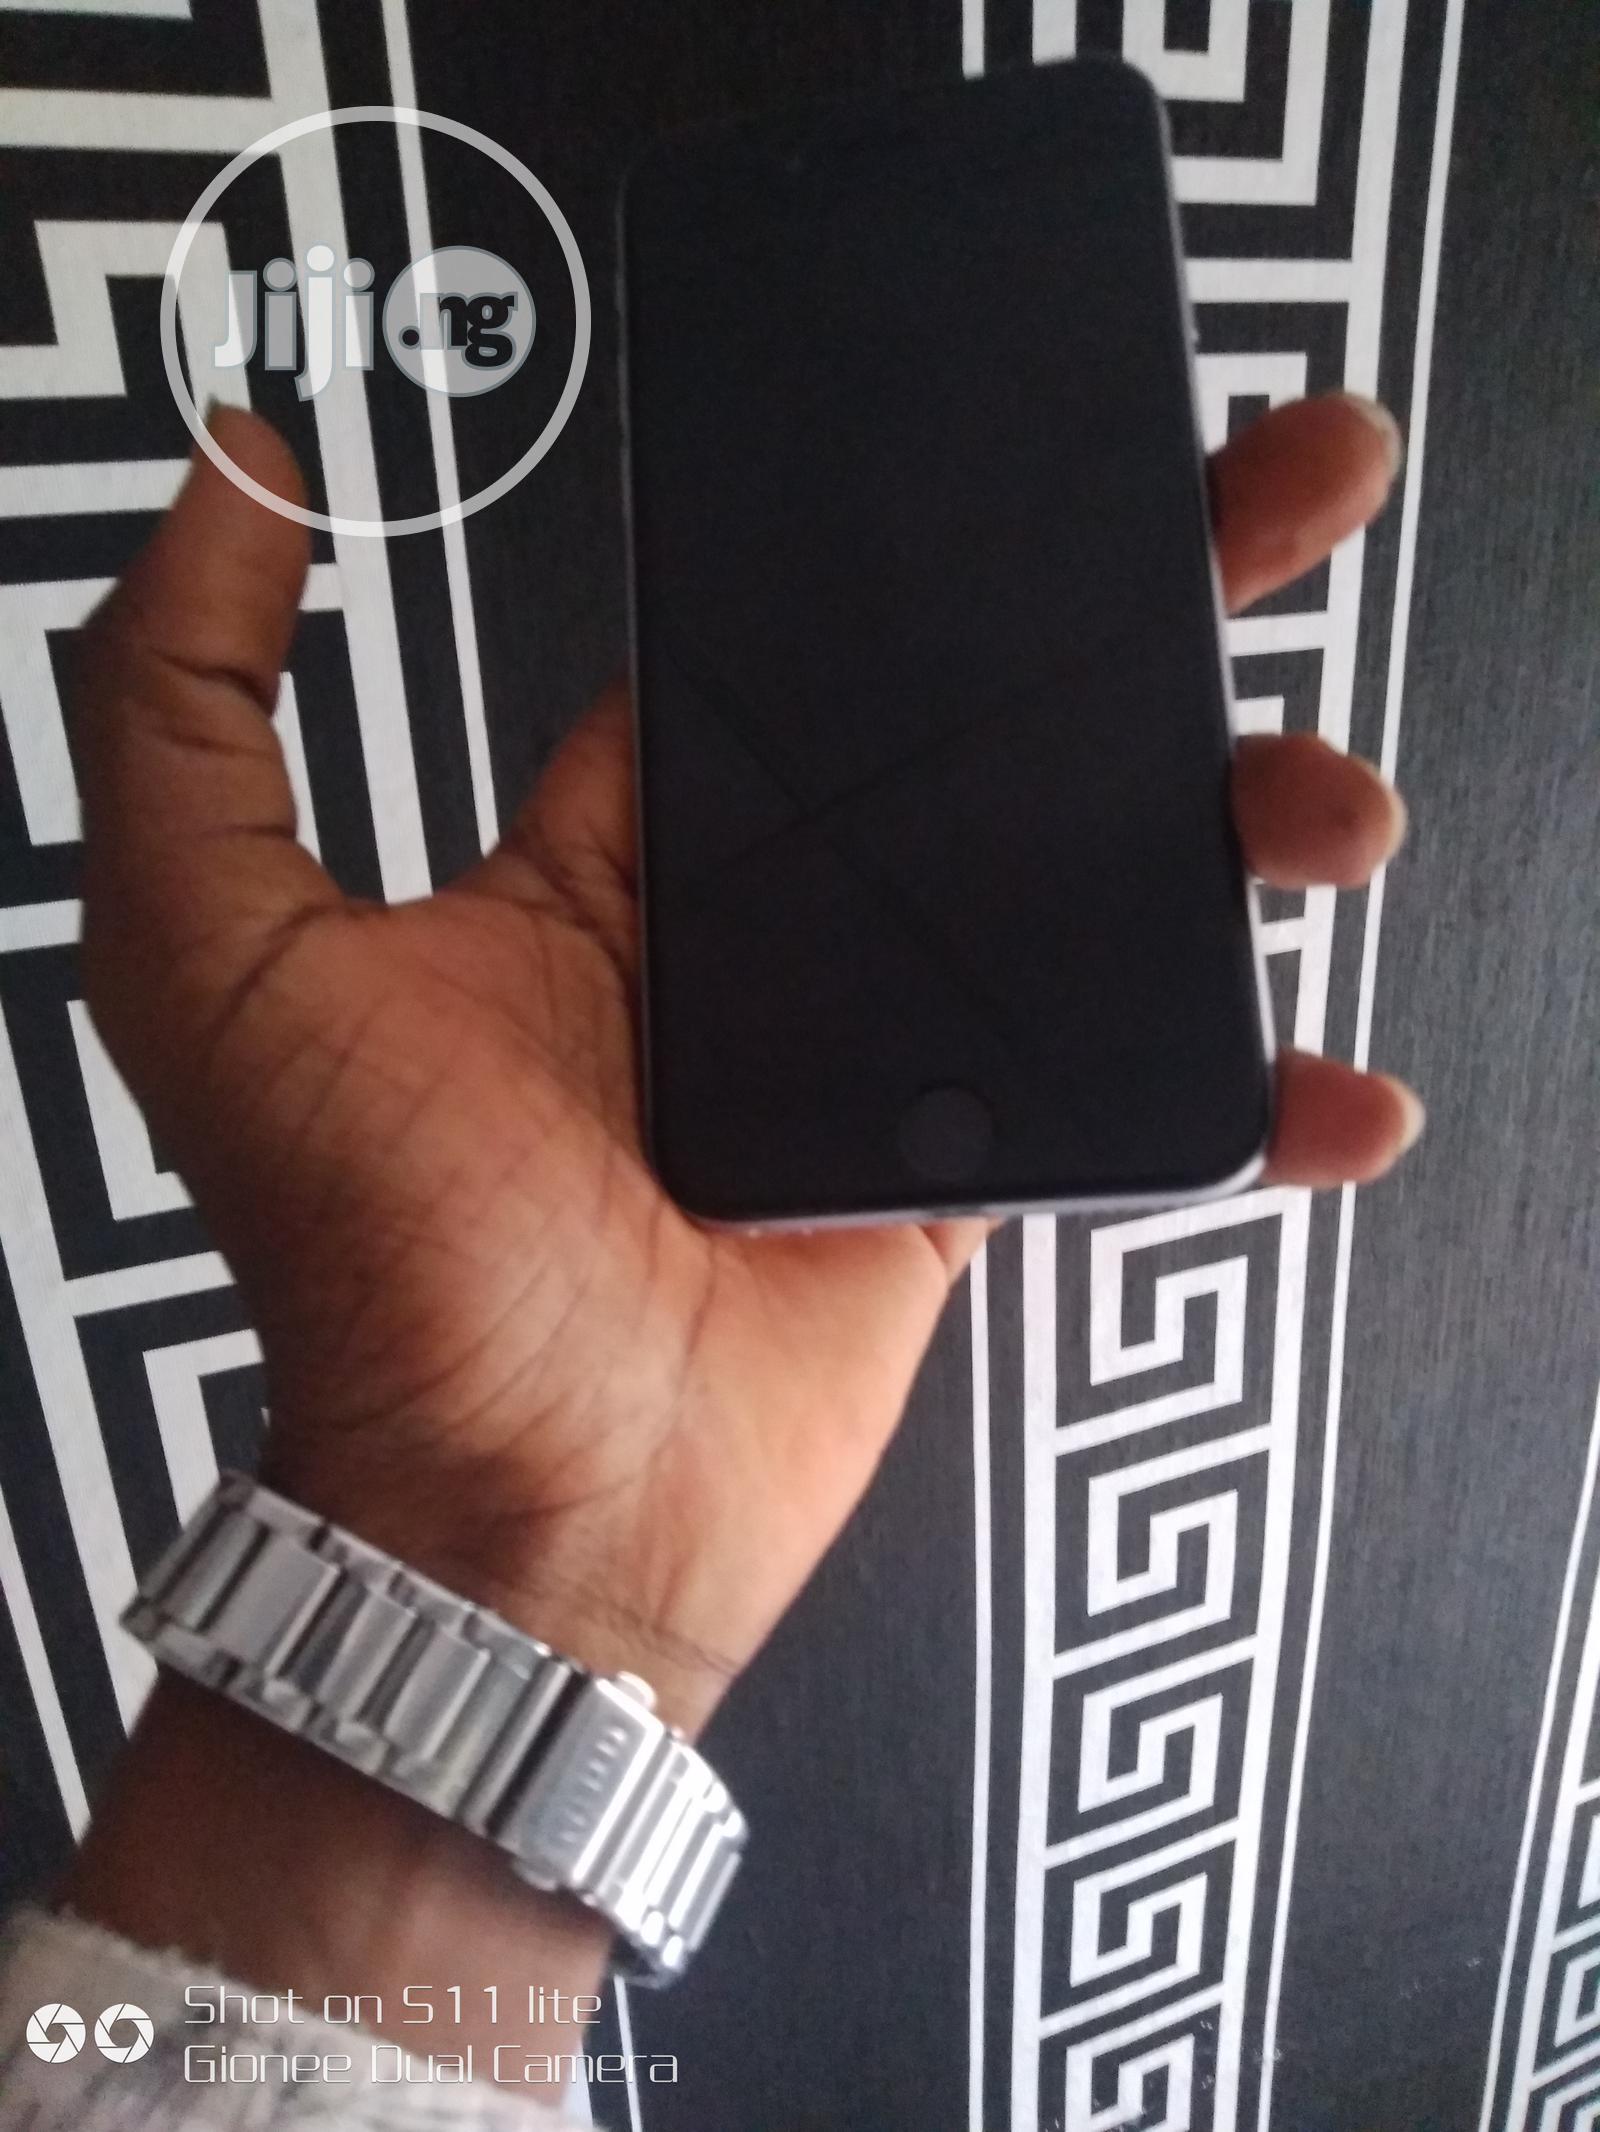 Apple iPhone 6 16 GB Gray | Mobile Phones for sale in Benin City, Edo State, Nigeria